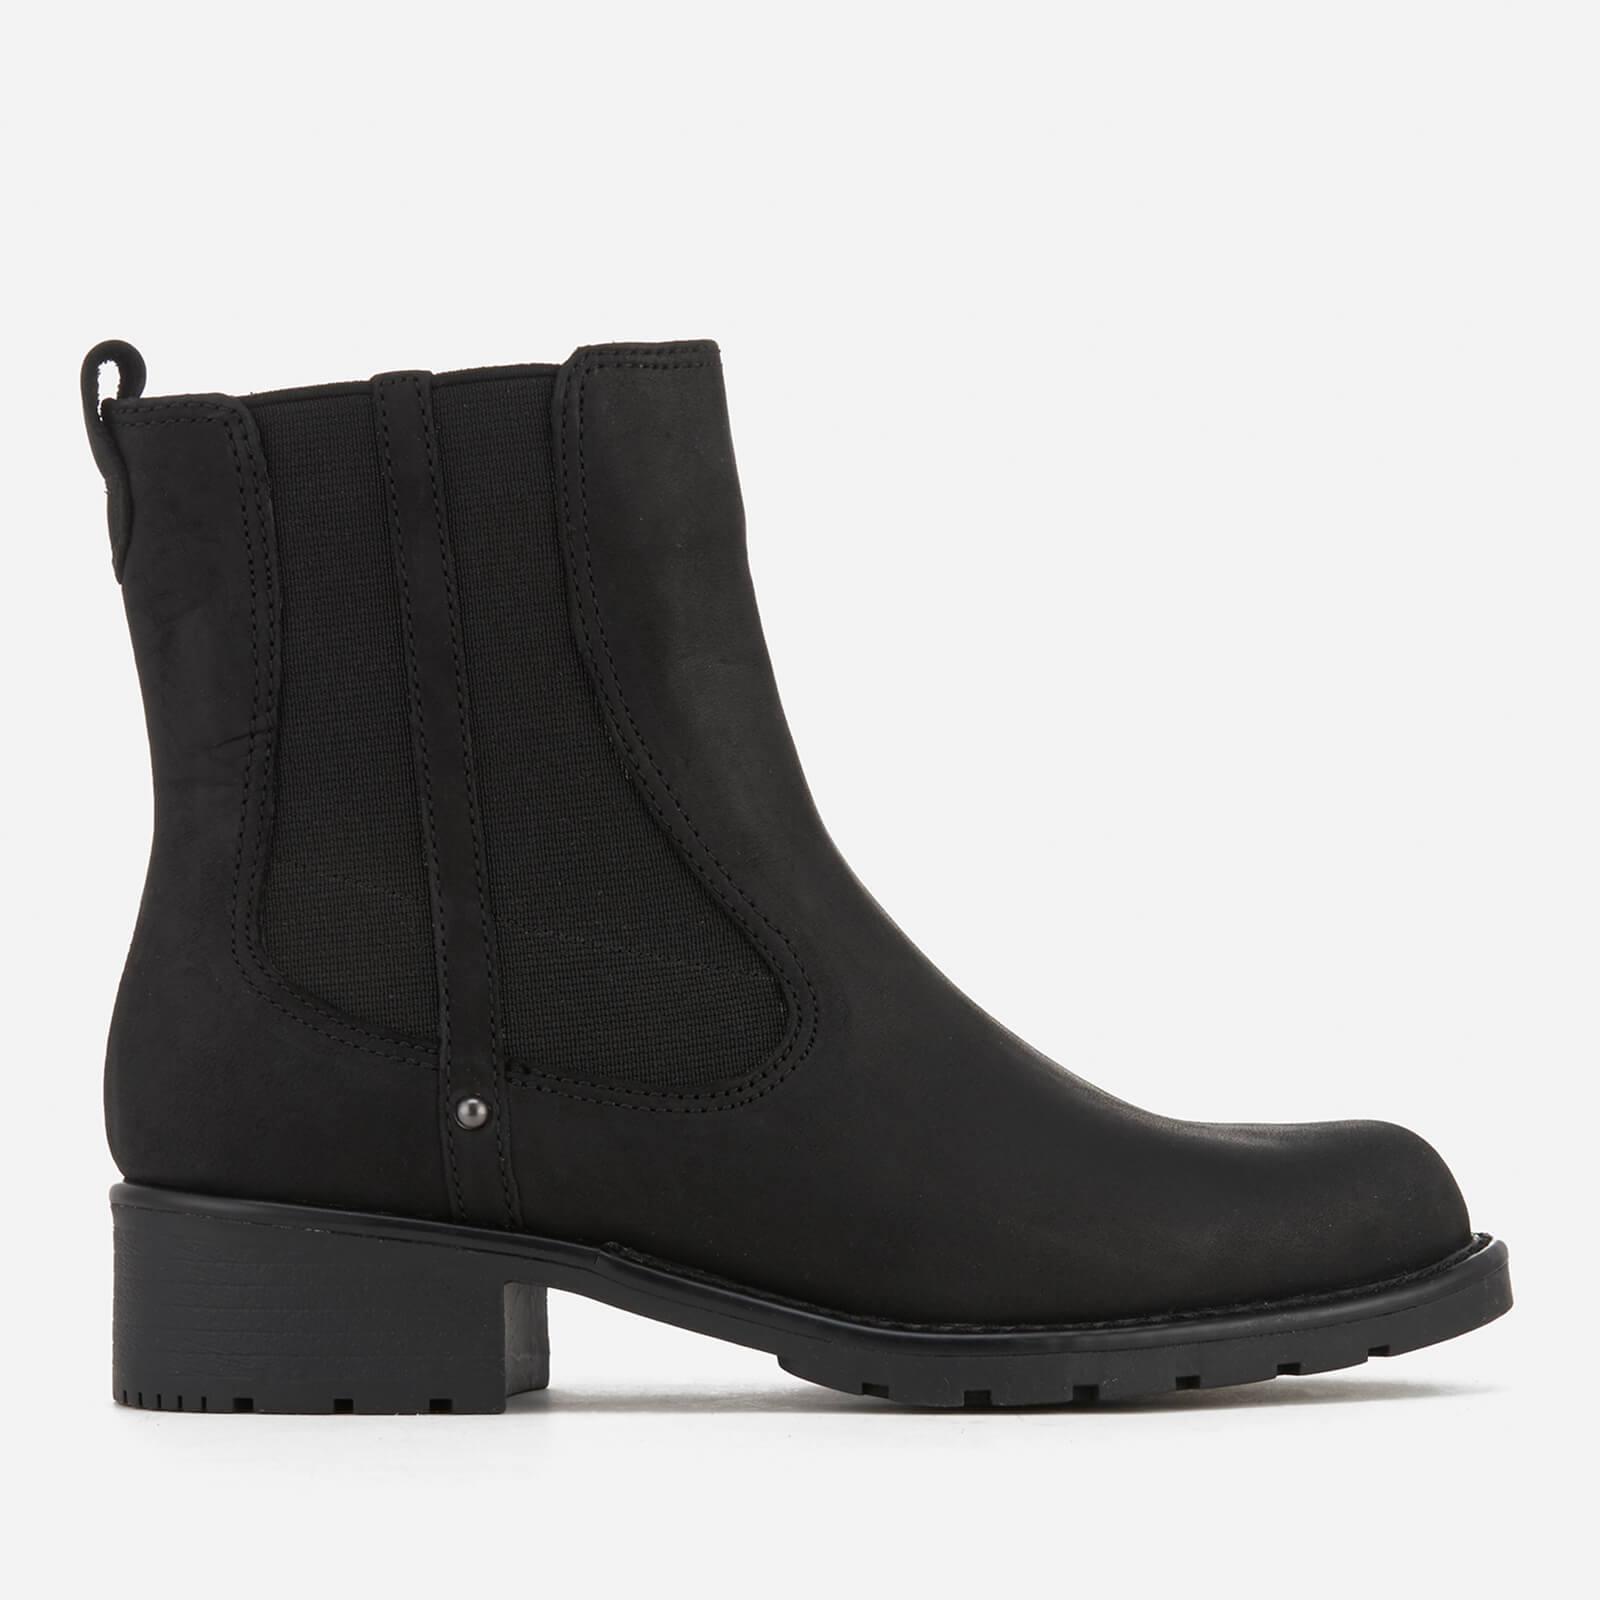 ever popular uk availability choose genuine Clarks Women's Orinoco Club Leather Chelsea Boots - Black